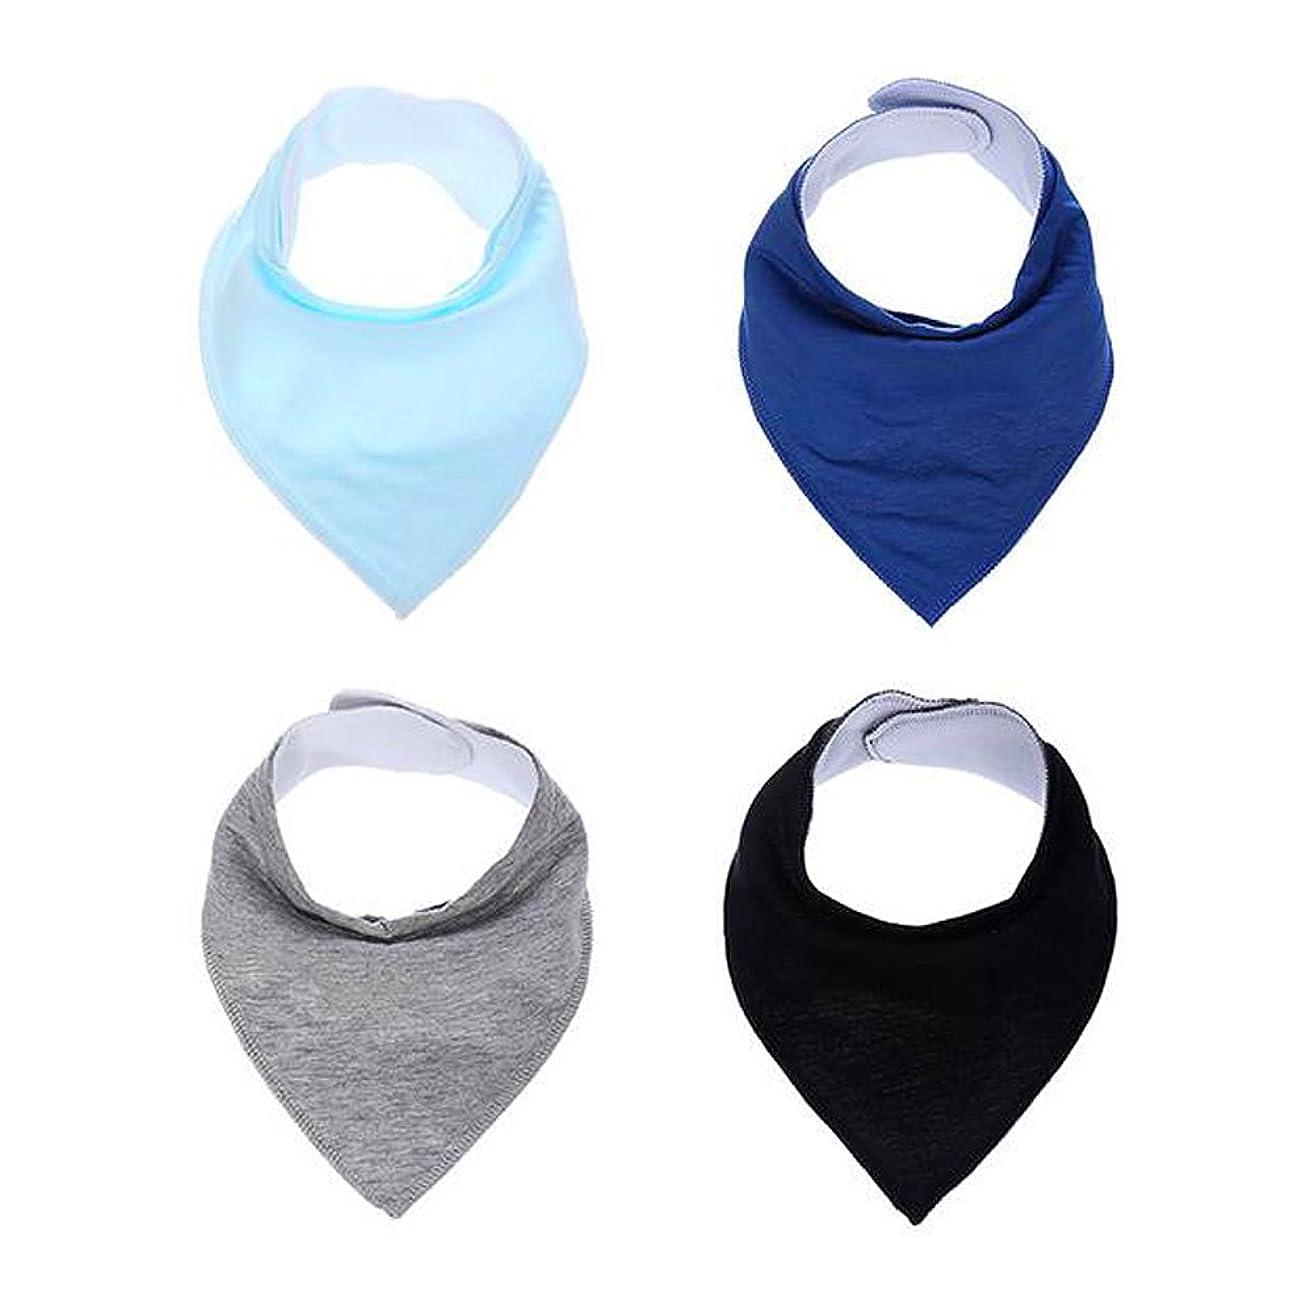 Baby Bibs Bandana Teething Organic Cotton boys girls Adjustable Snap triangle Drool Bib set (Solid color 2 #)